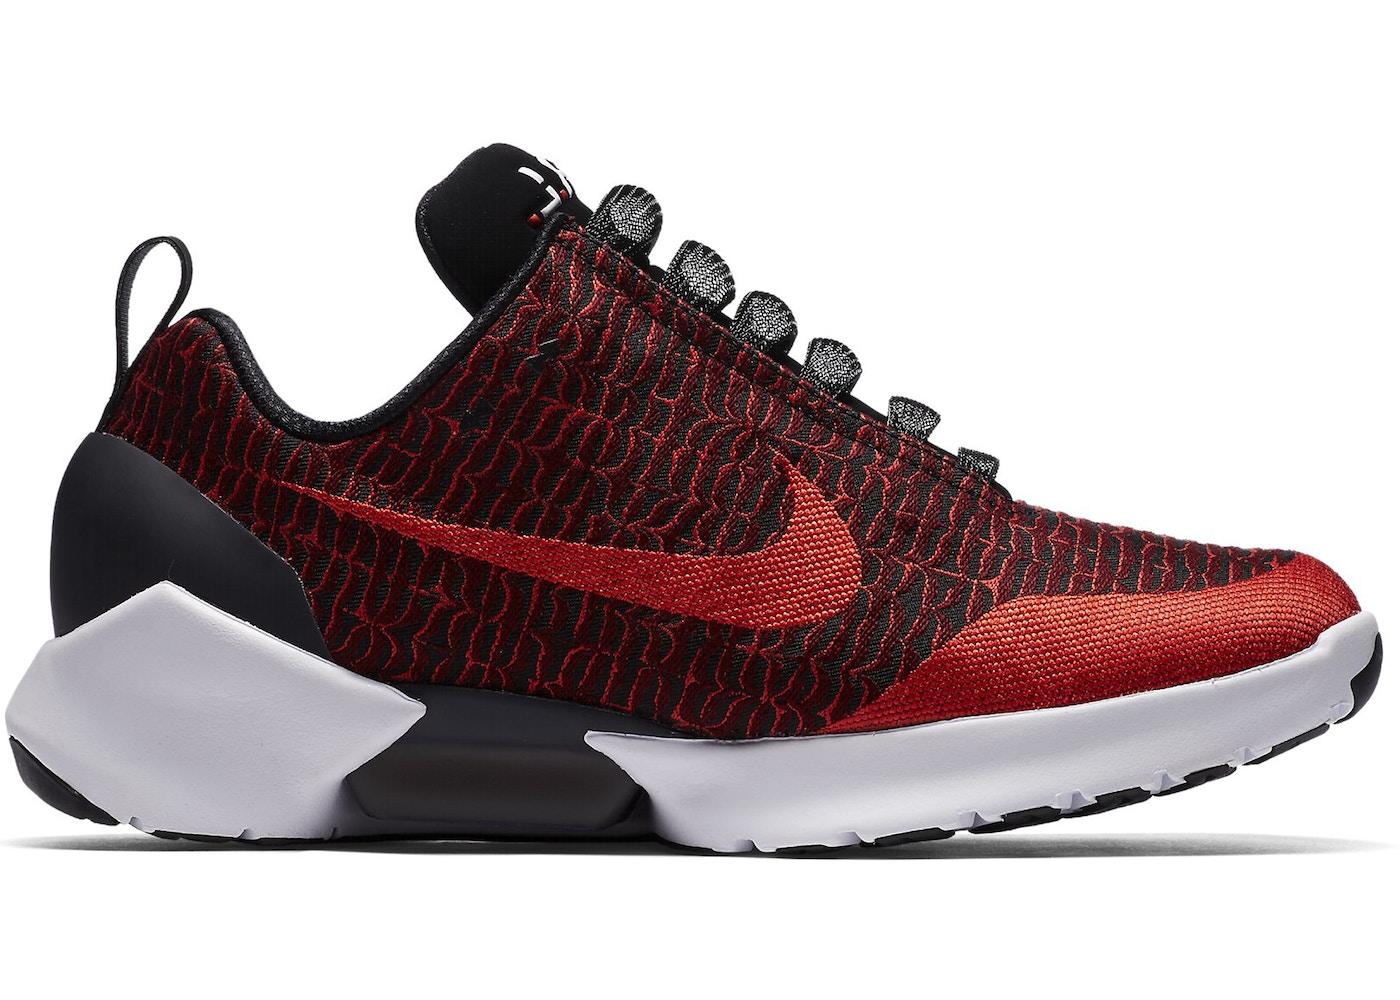 Nike HyperAdapt 1.0 Habanero Red - 843871-600 3dc410b09d0e